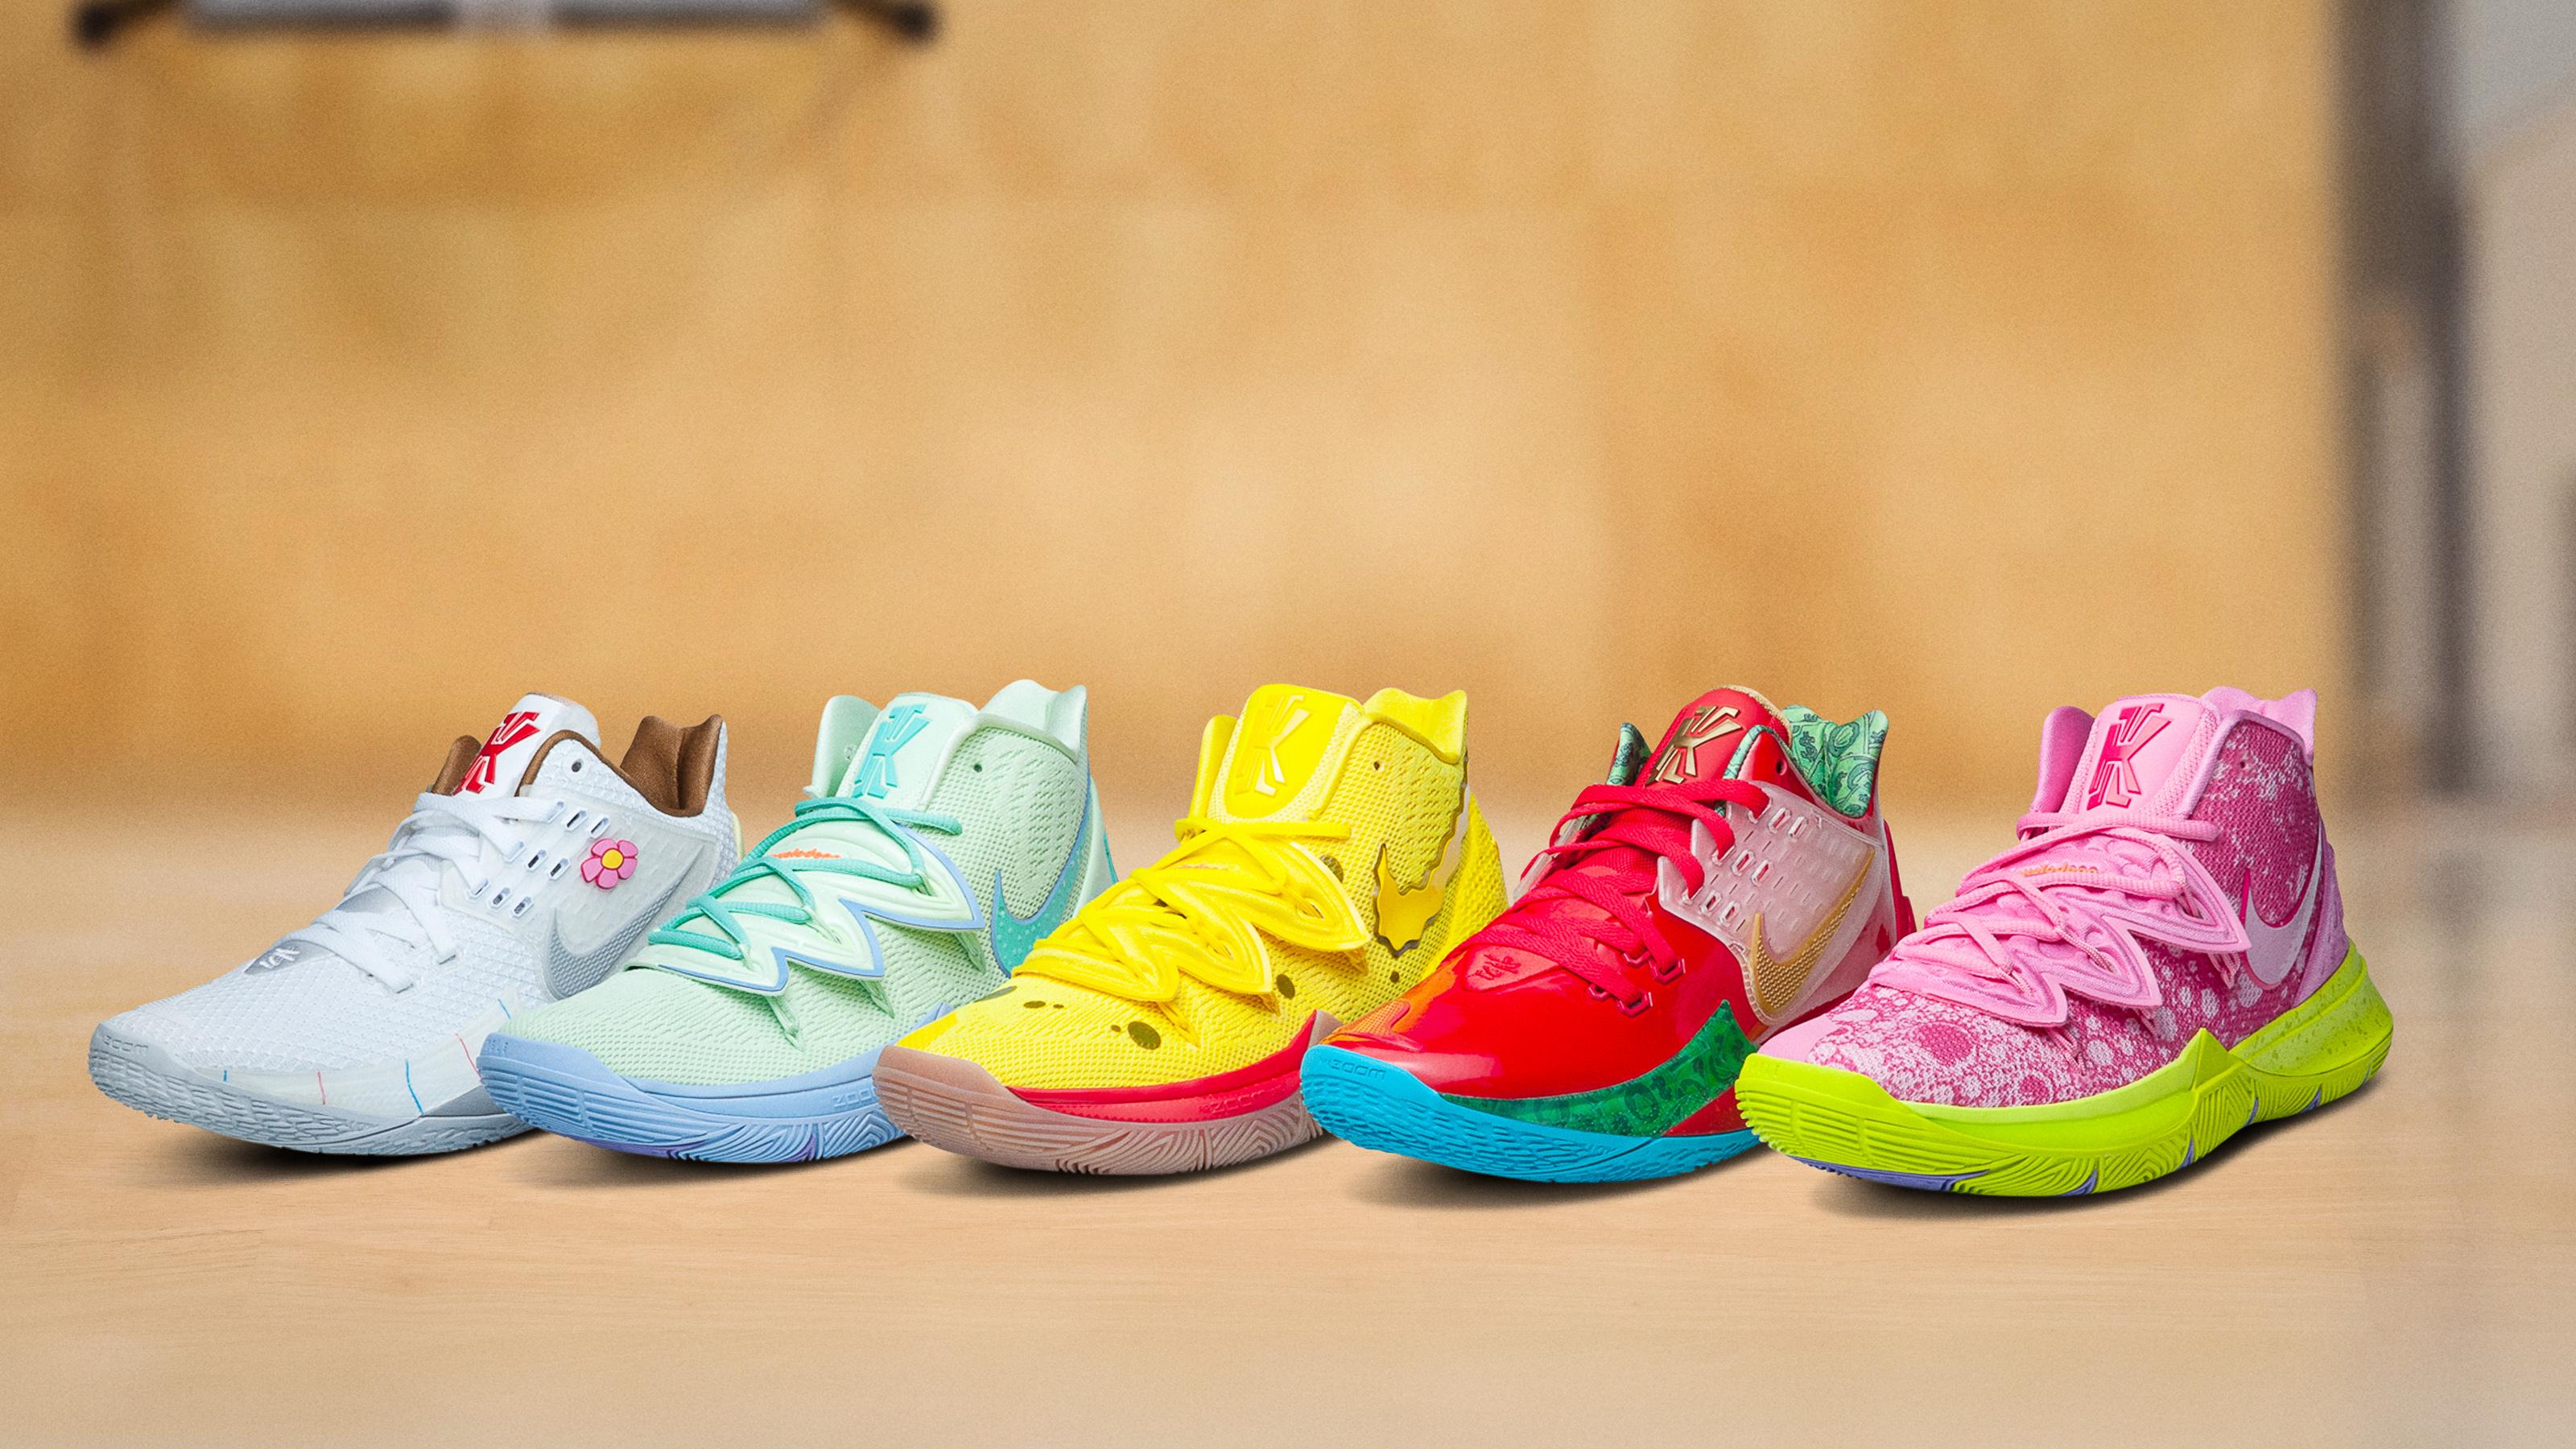 Kyrie x SpongeBob SquarePants Nike Pack